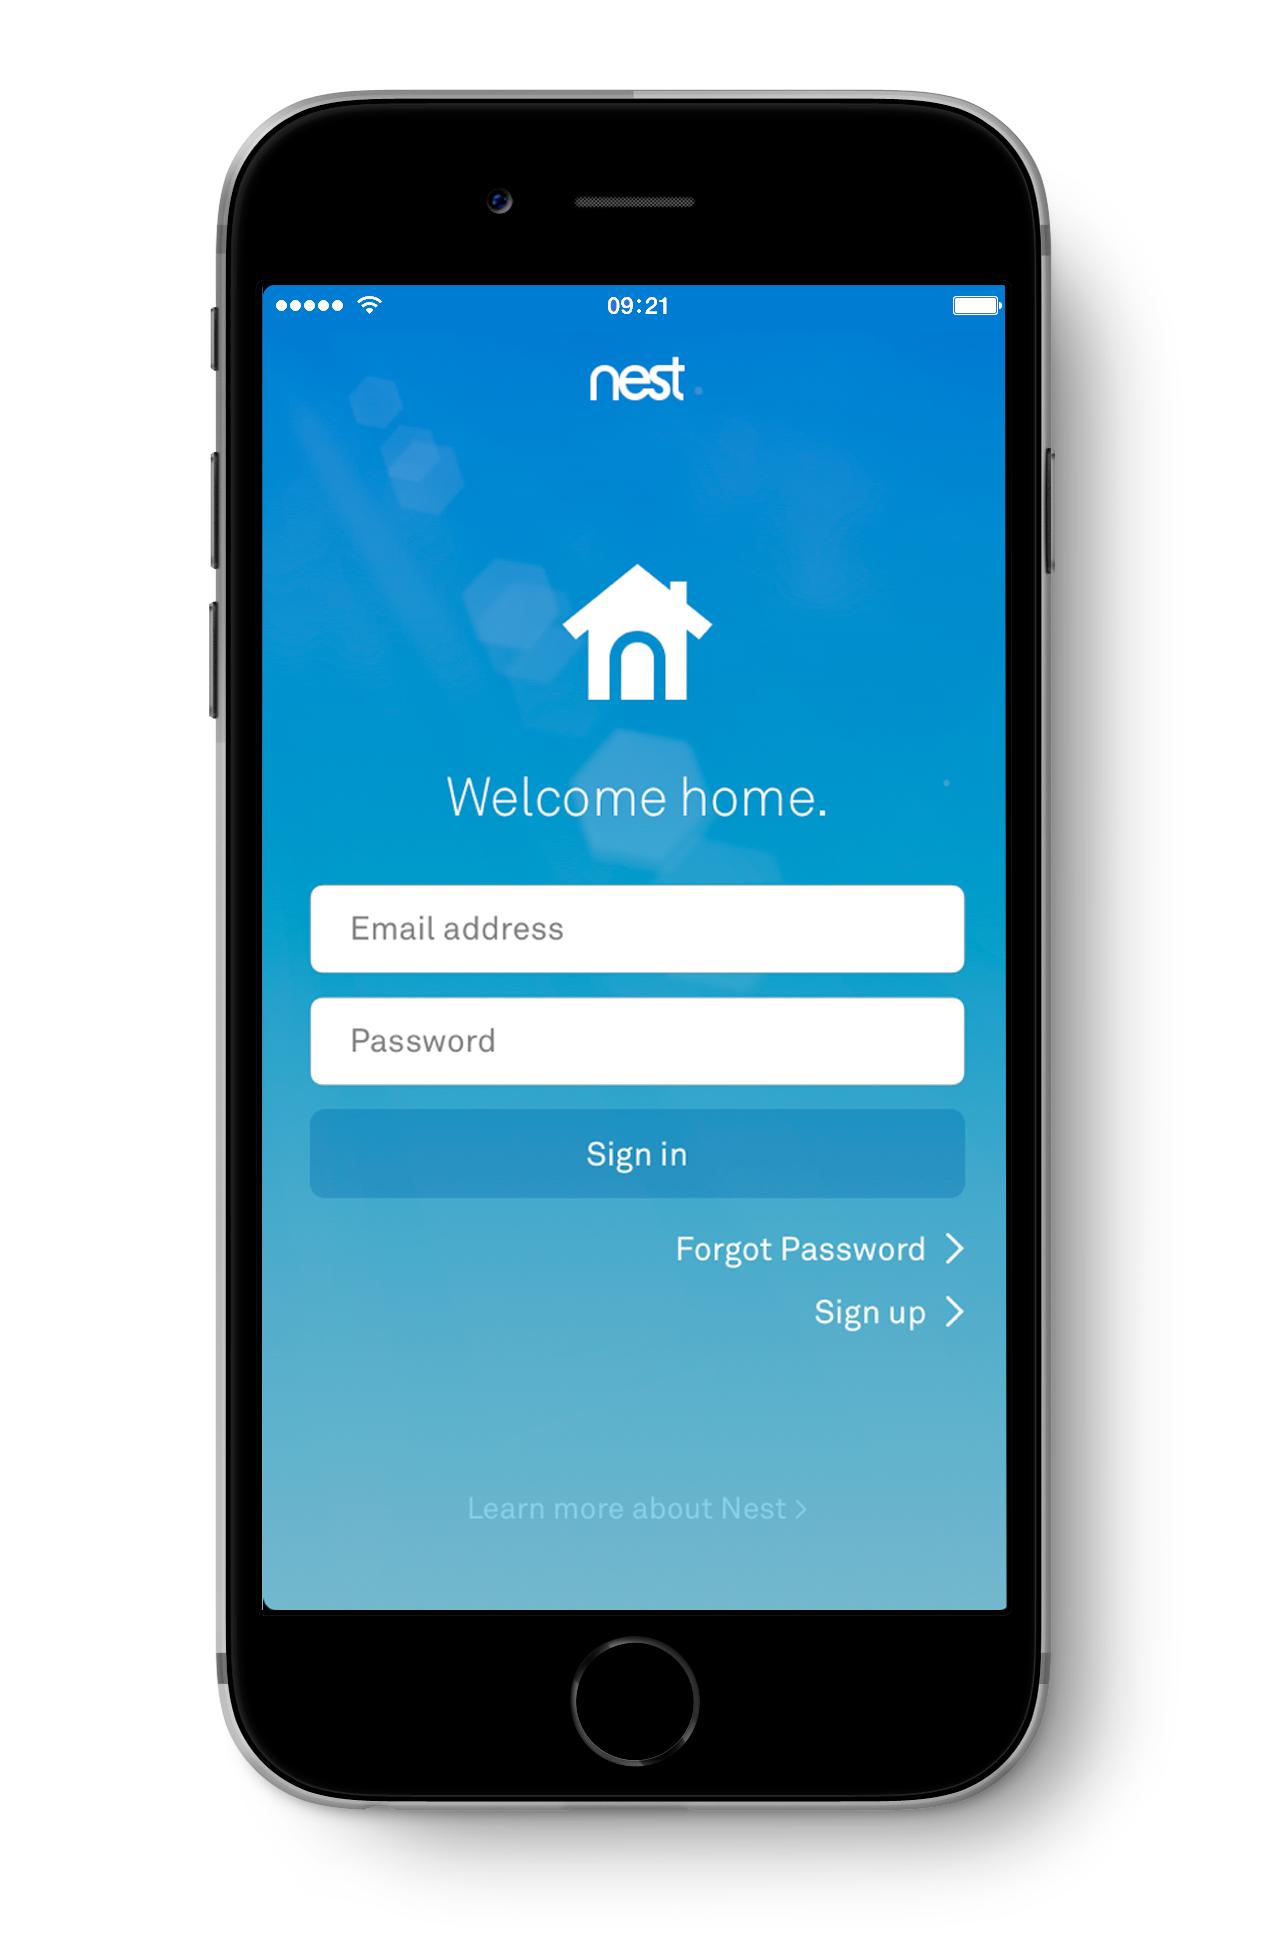 Nest app login screen.